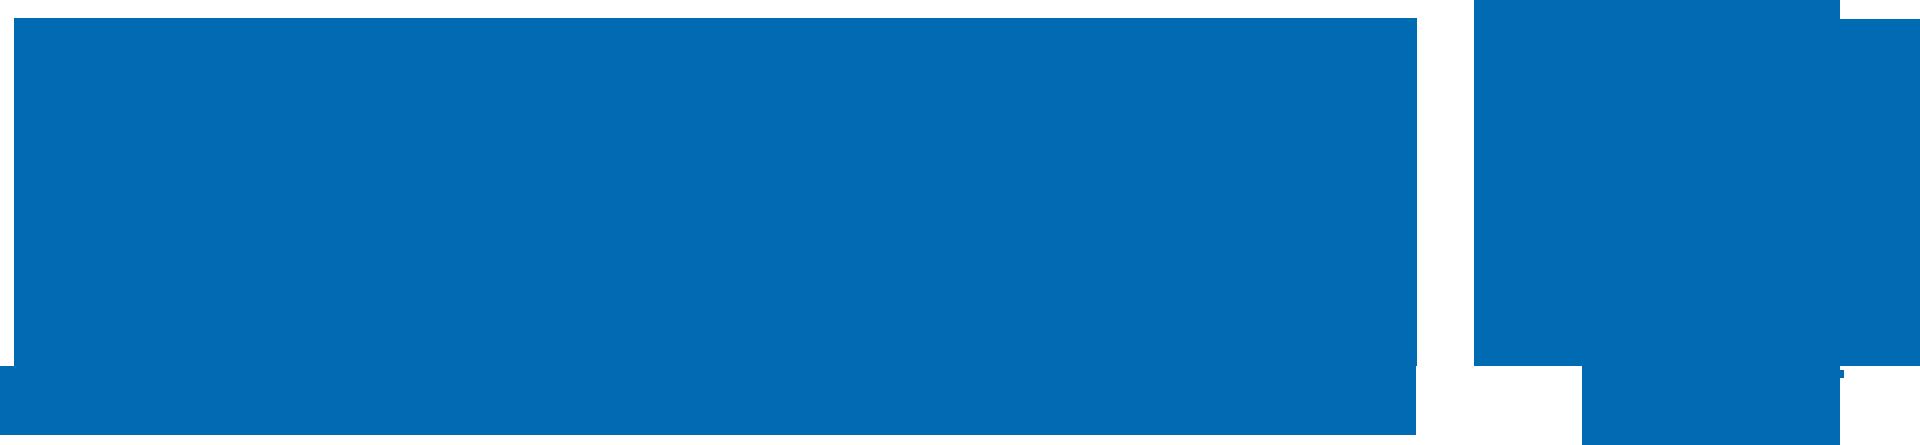 Sibra GmbH